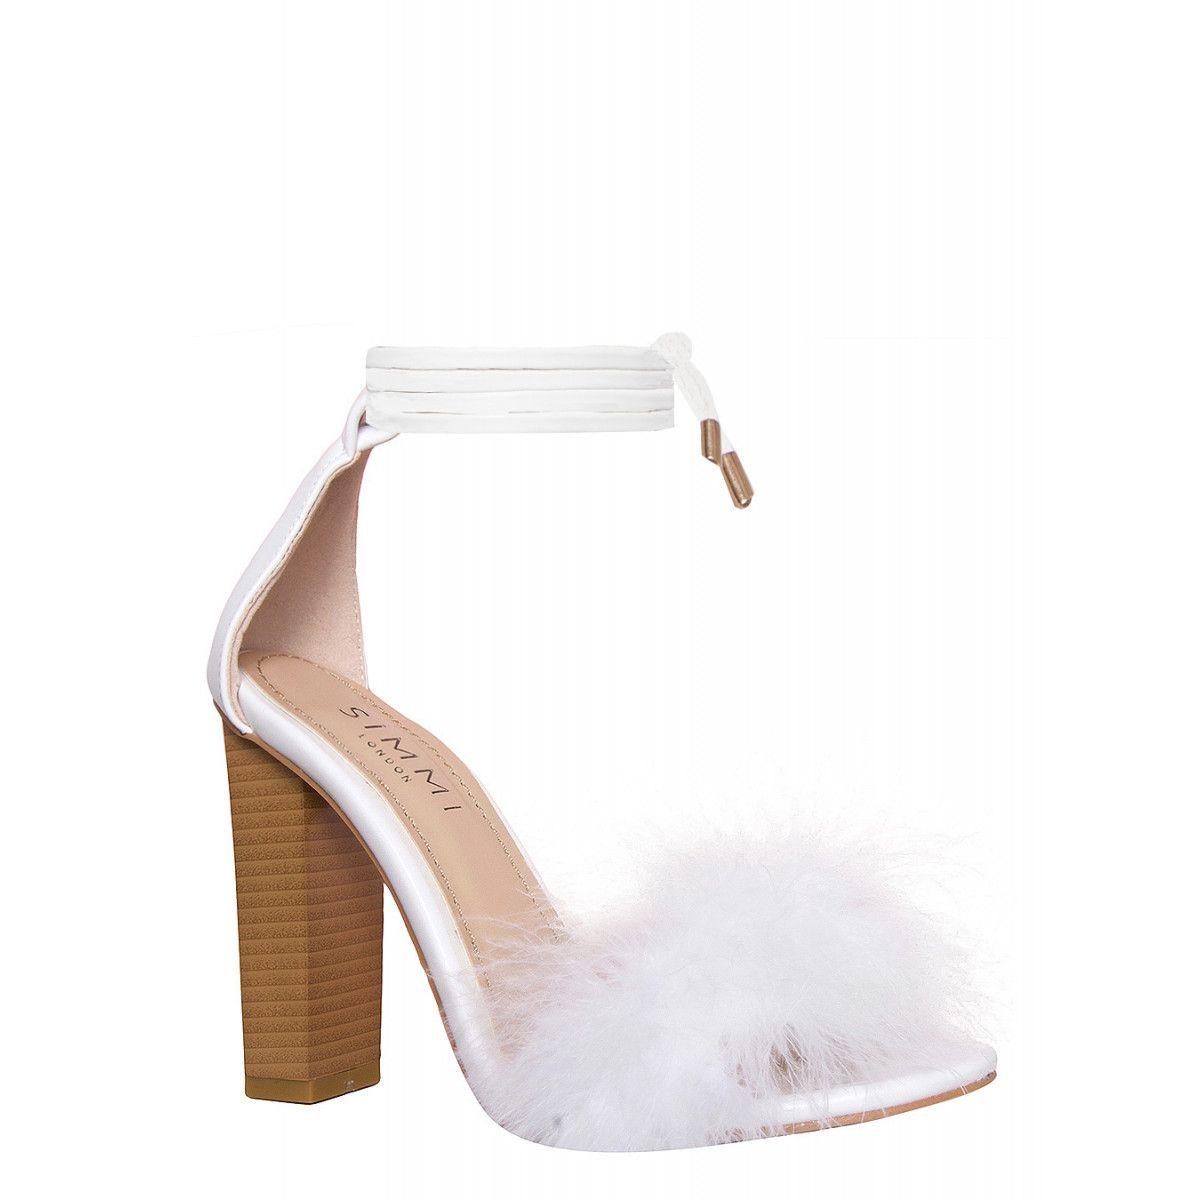 e06eedeee95 Tayen White Fluffy Lace Up Block Heels   Simmi Shoes